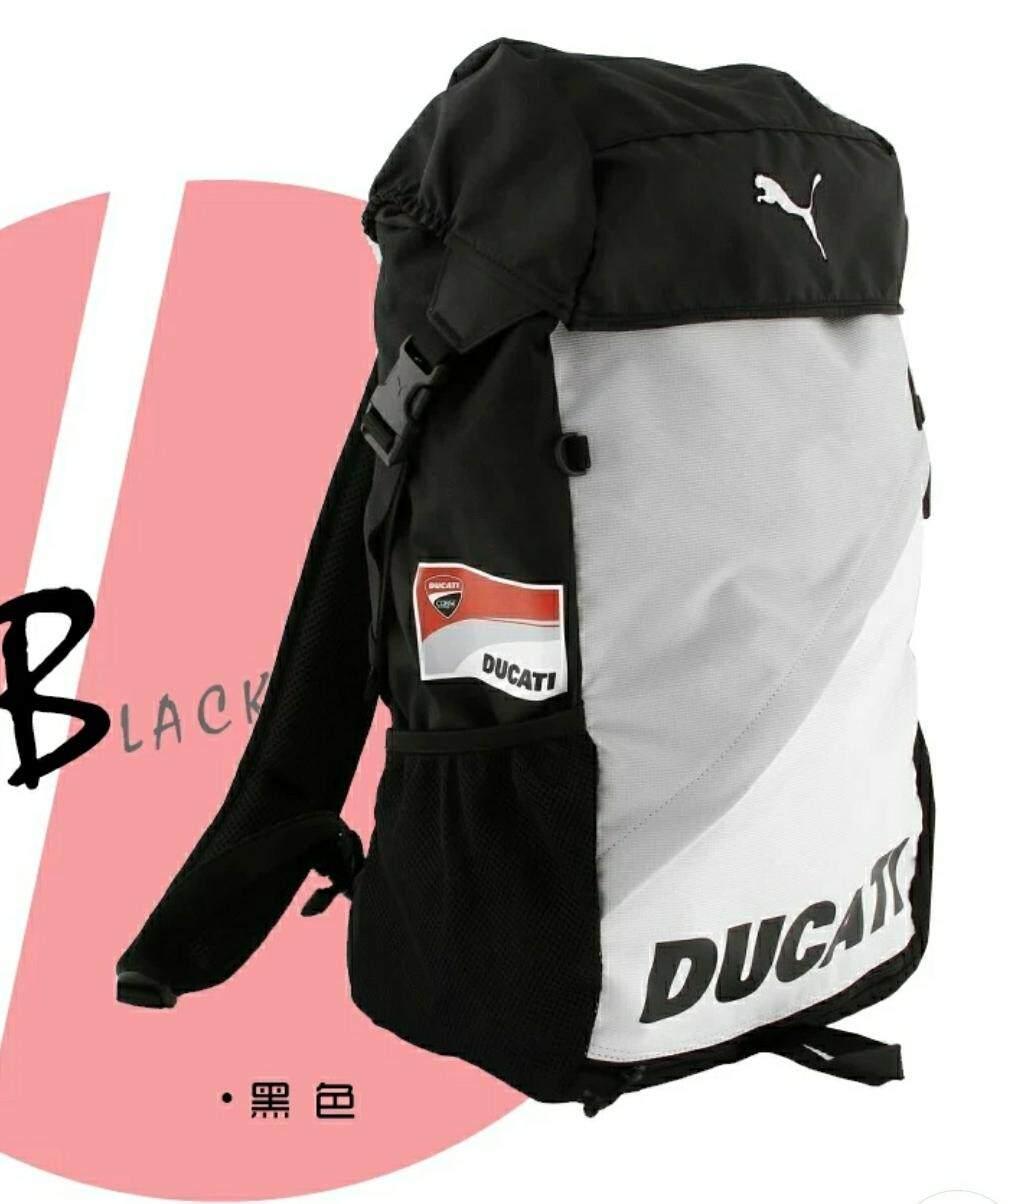 91b6cb7086db Ducati - Buy Ducati at Best Price in Malaysia